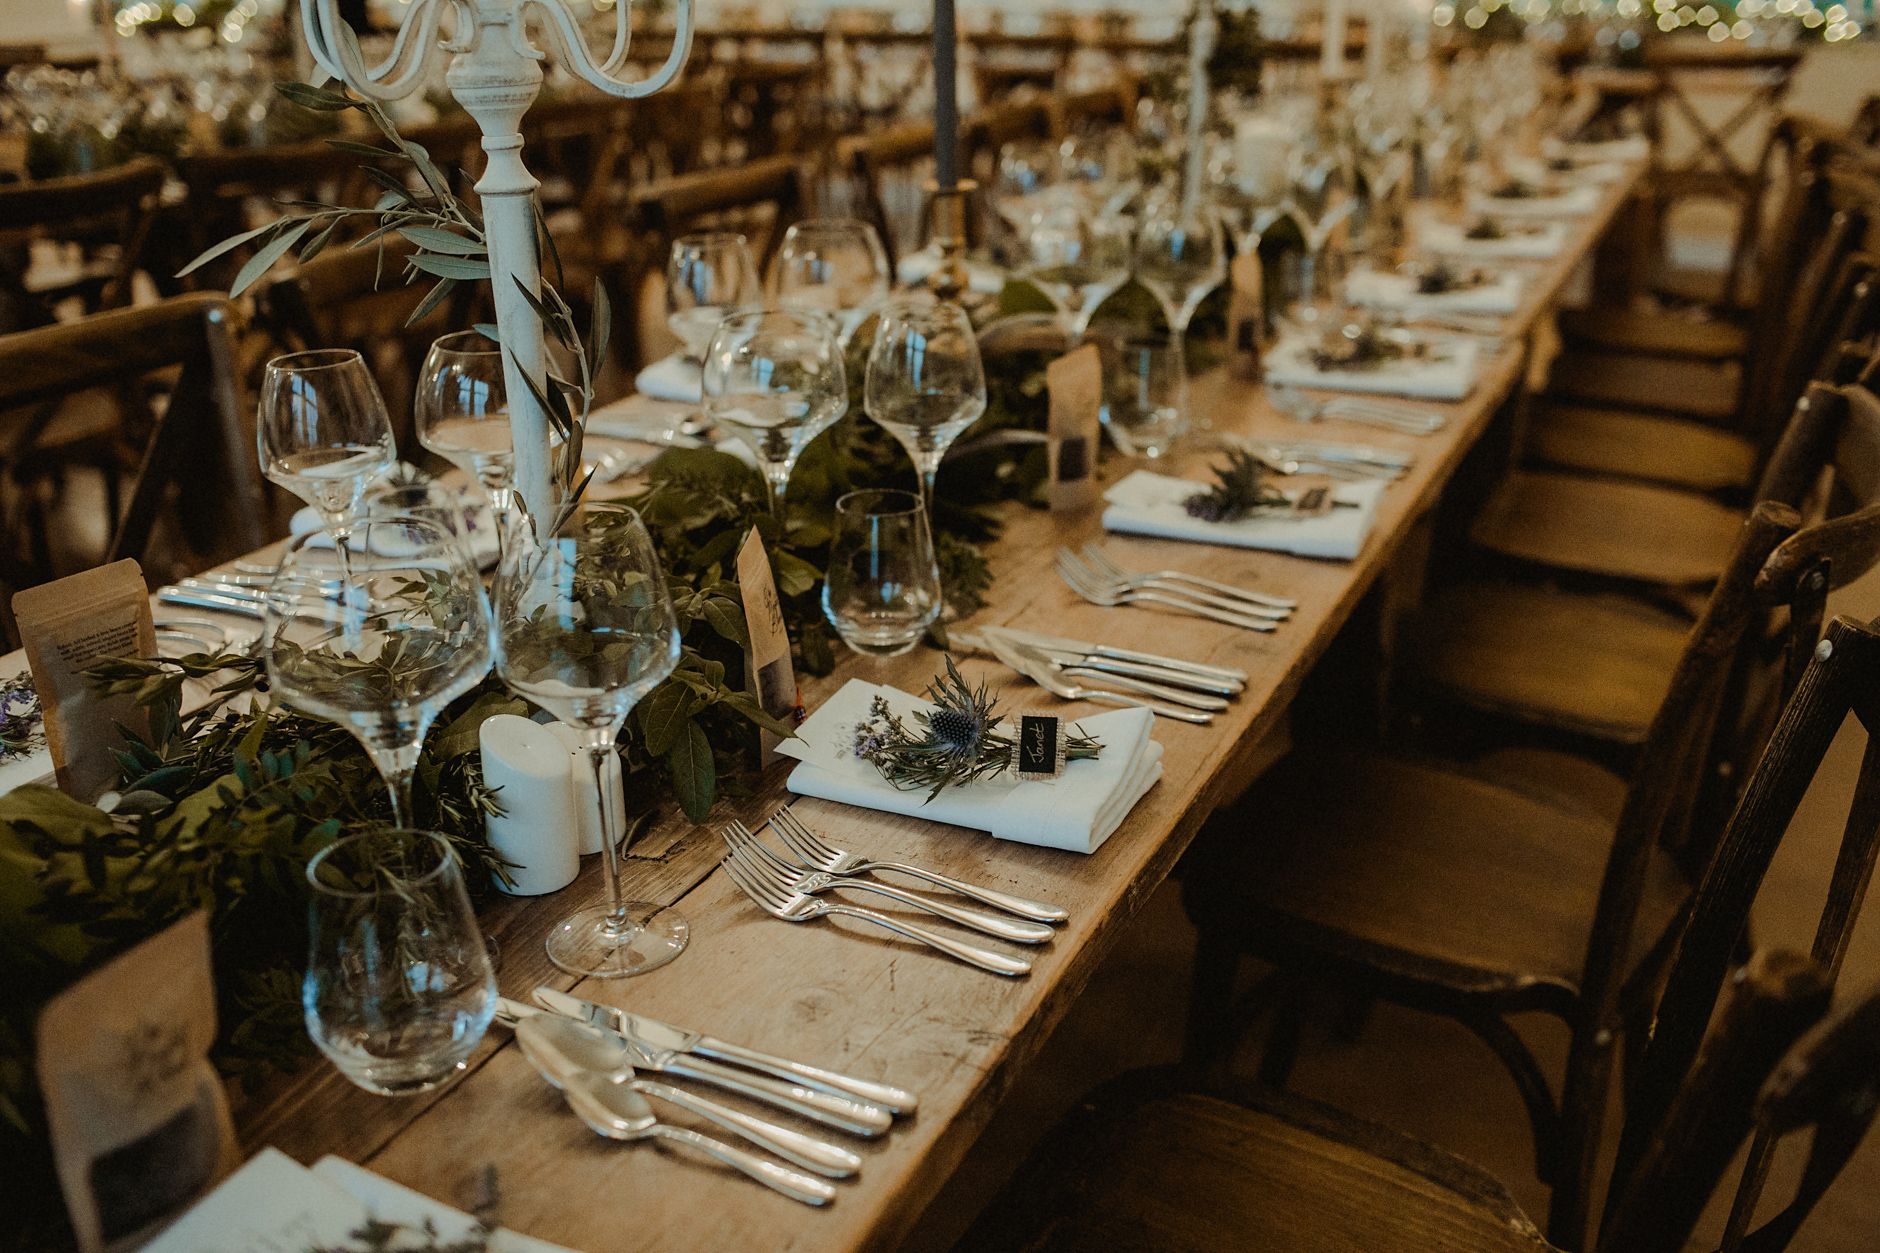 Glentruim-Wedding-Nikki-Leadbetter-Photography-212.jpg